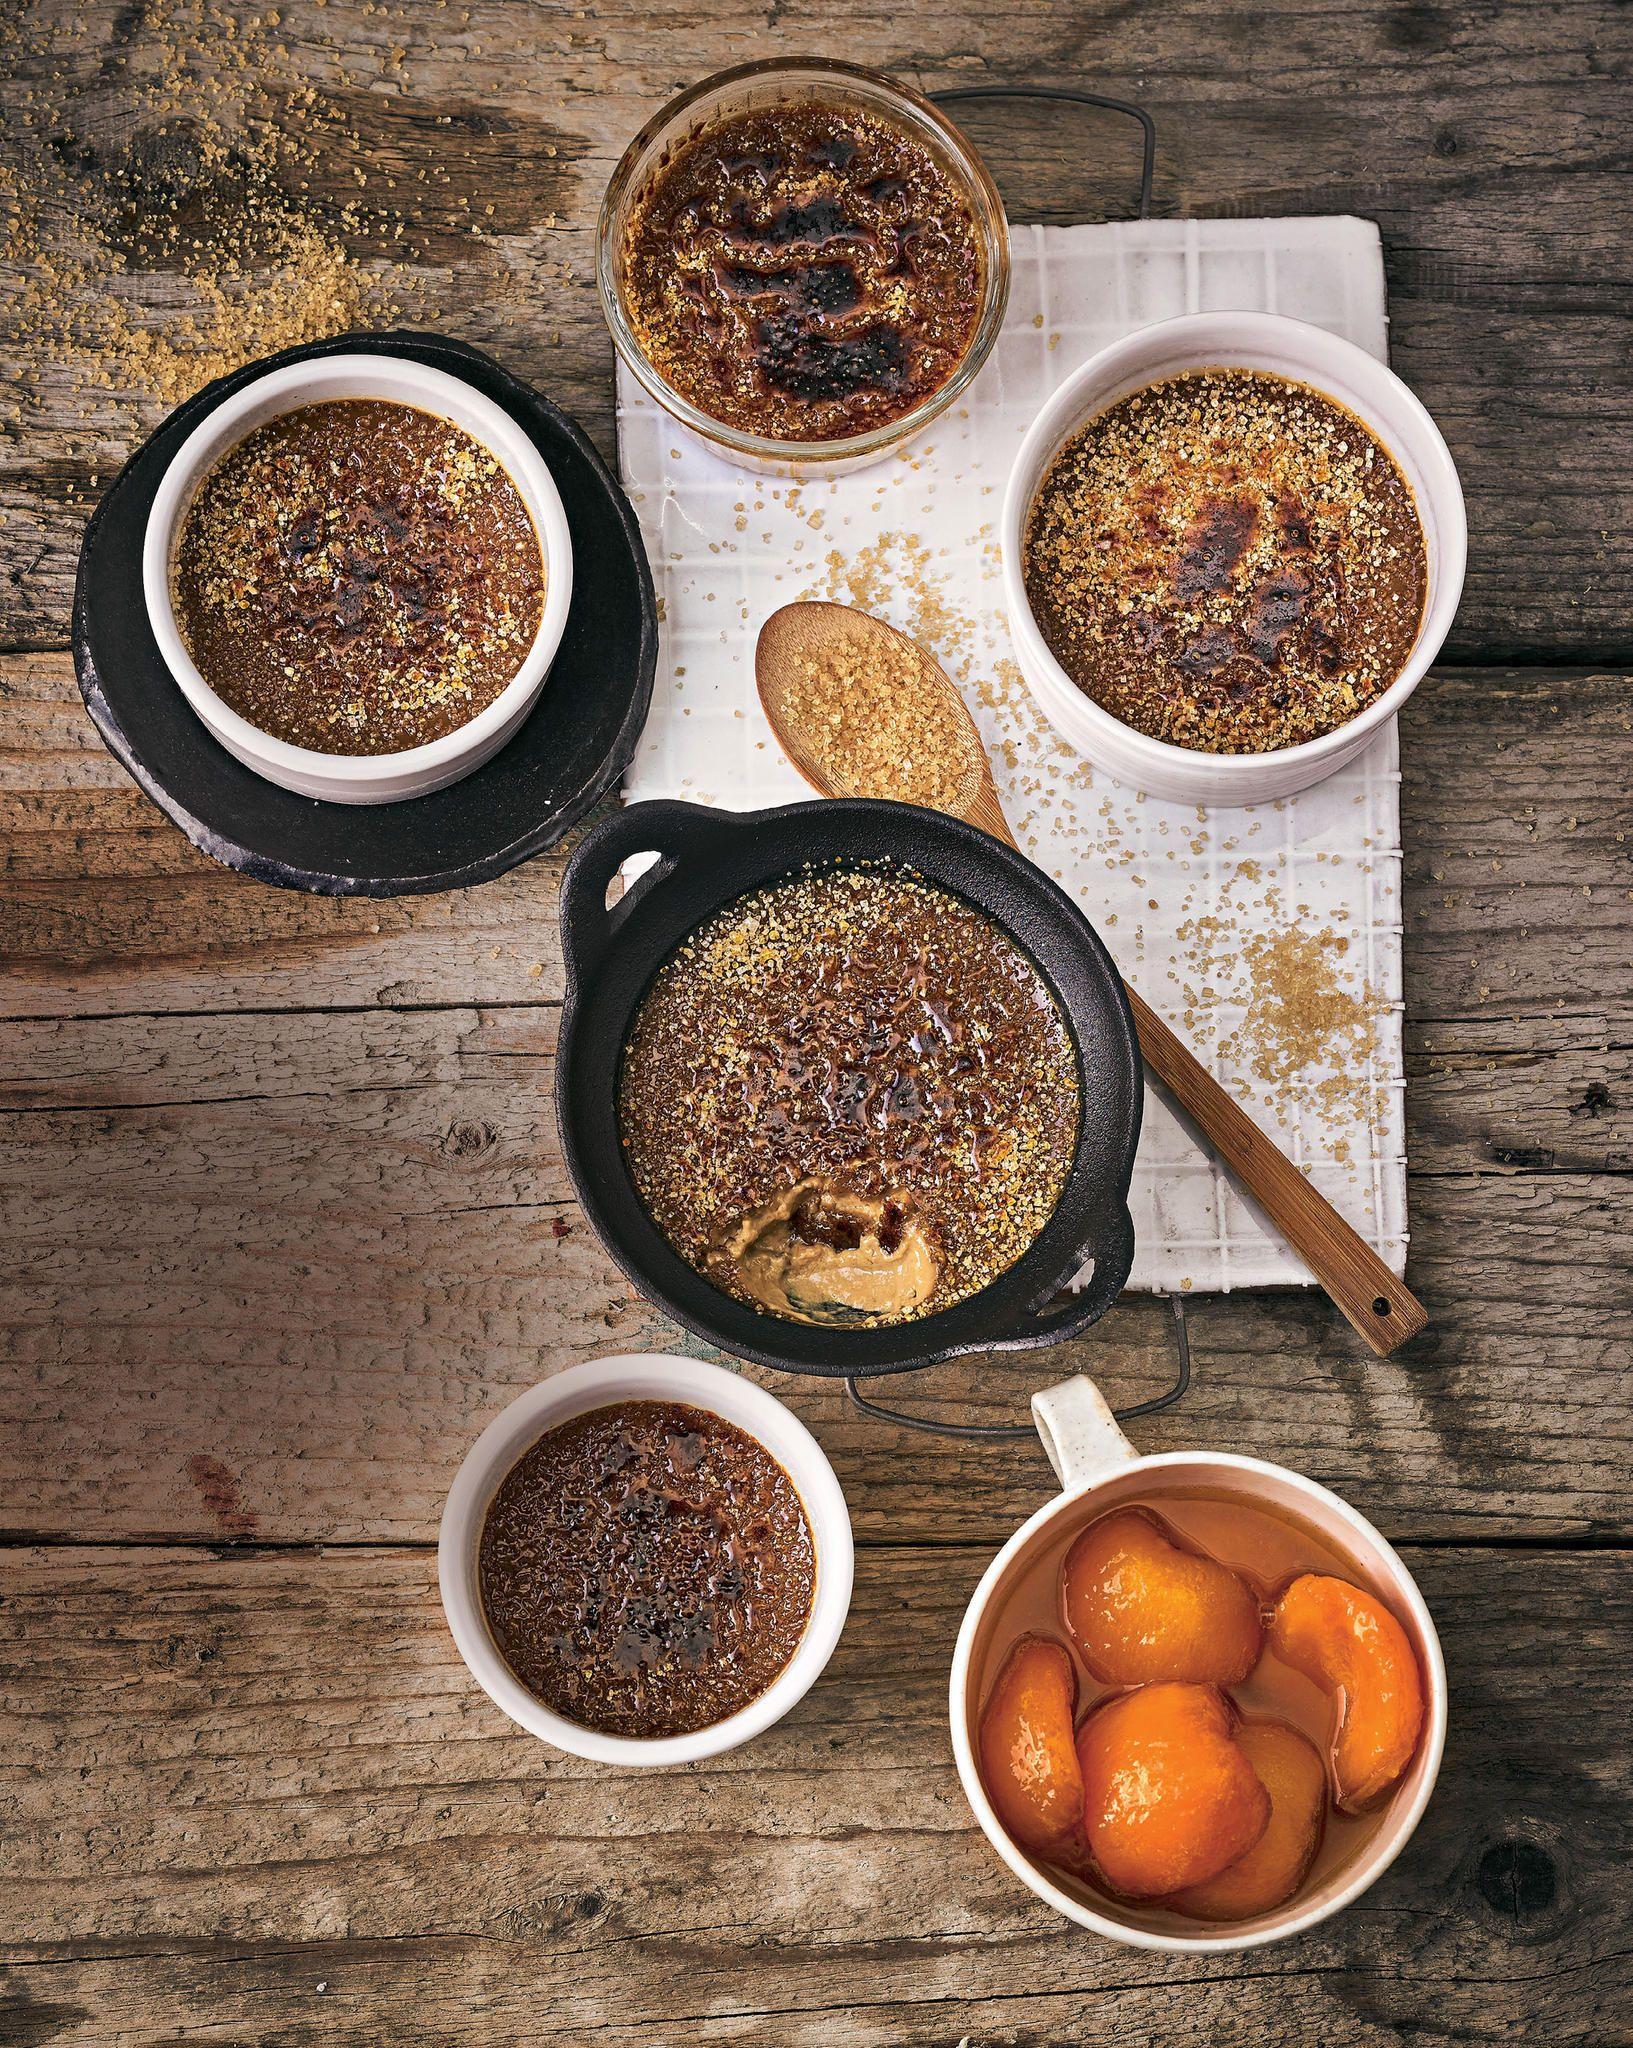 Schokoladen Creme Brulee Mit Aprikosenkompott